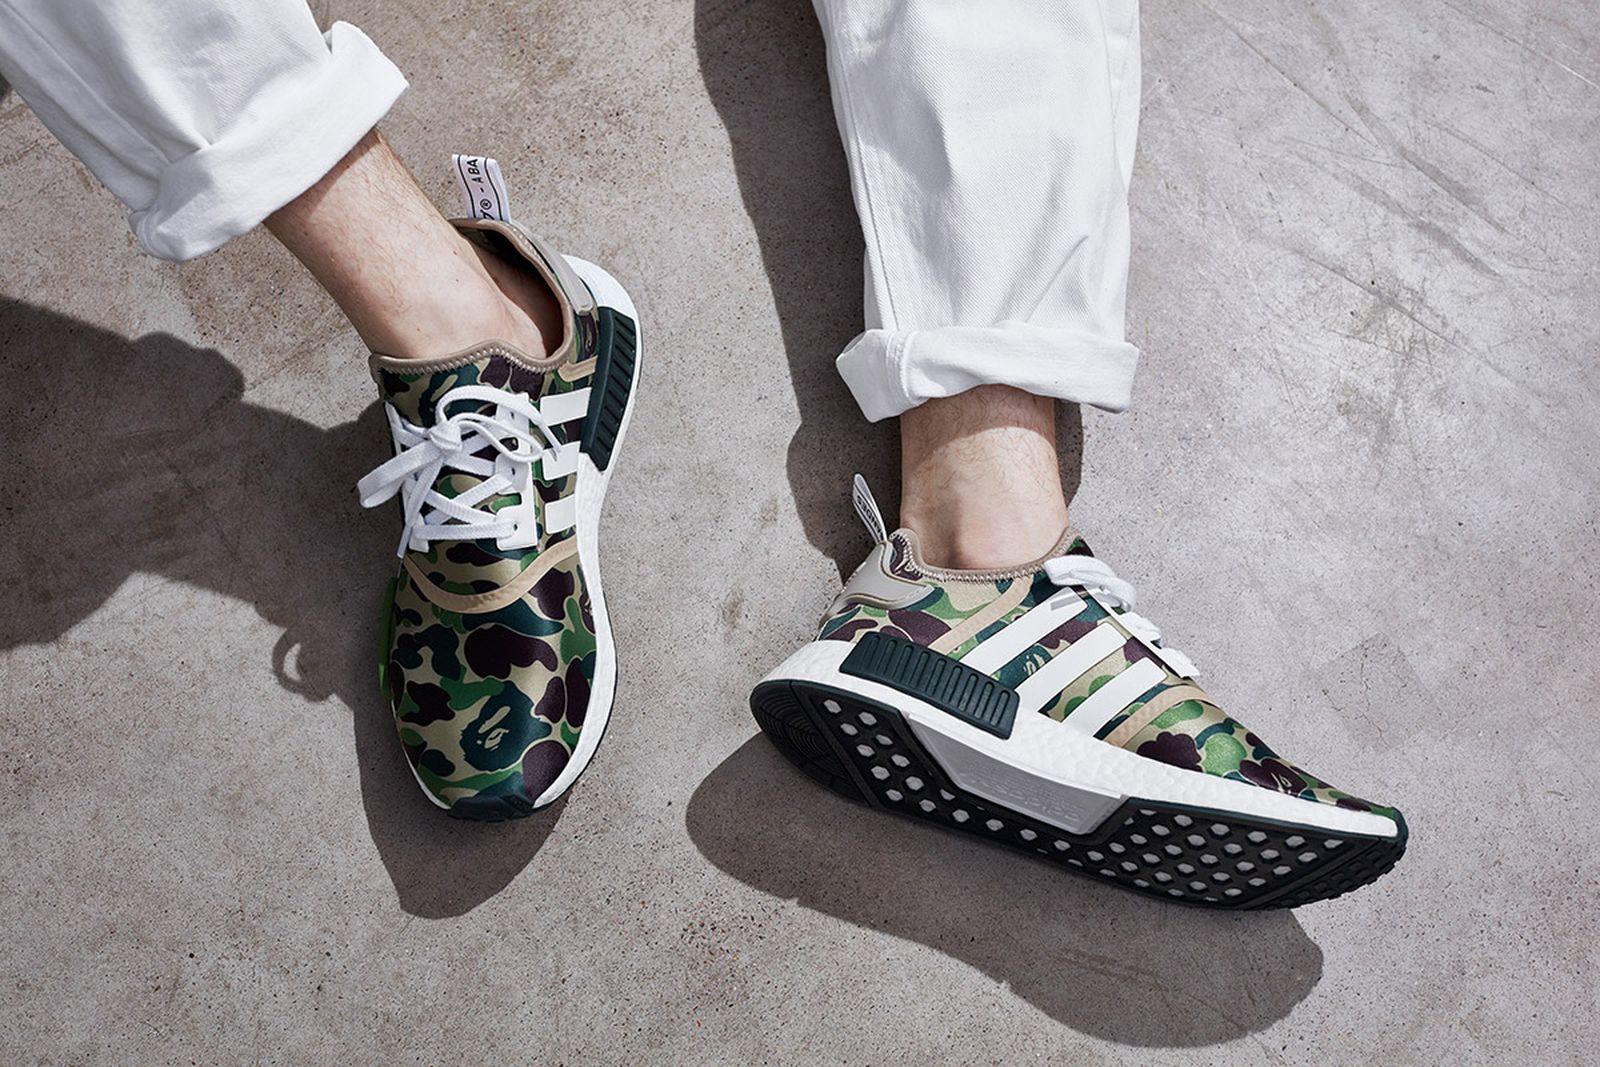 marca esponja Acuoso  adidas x BAPE: Every Collaboration Ever